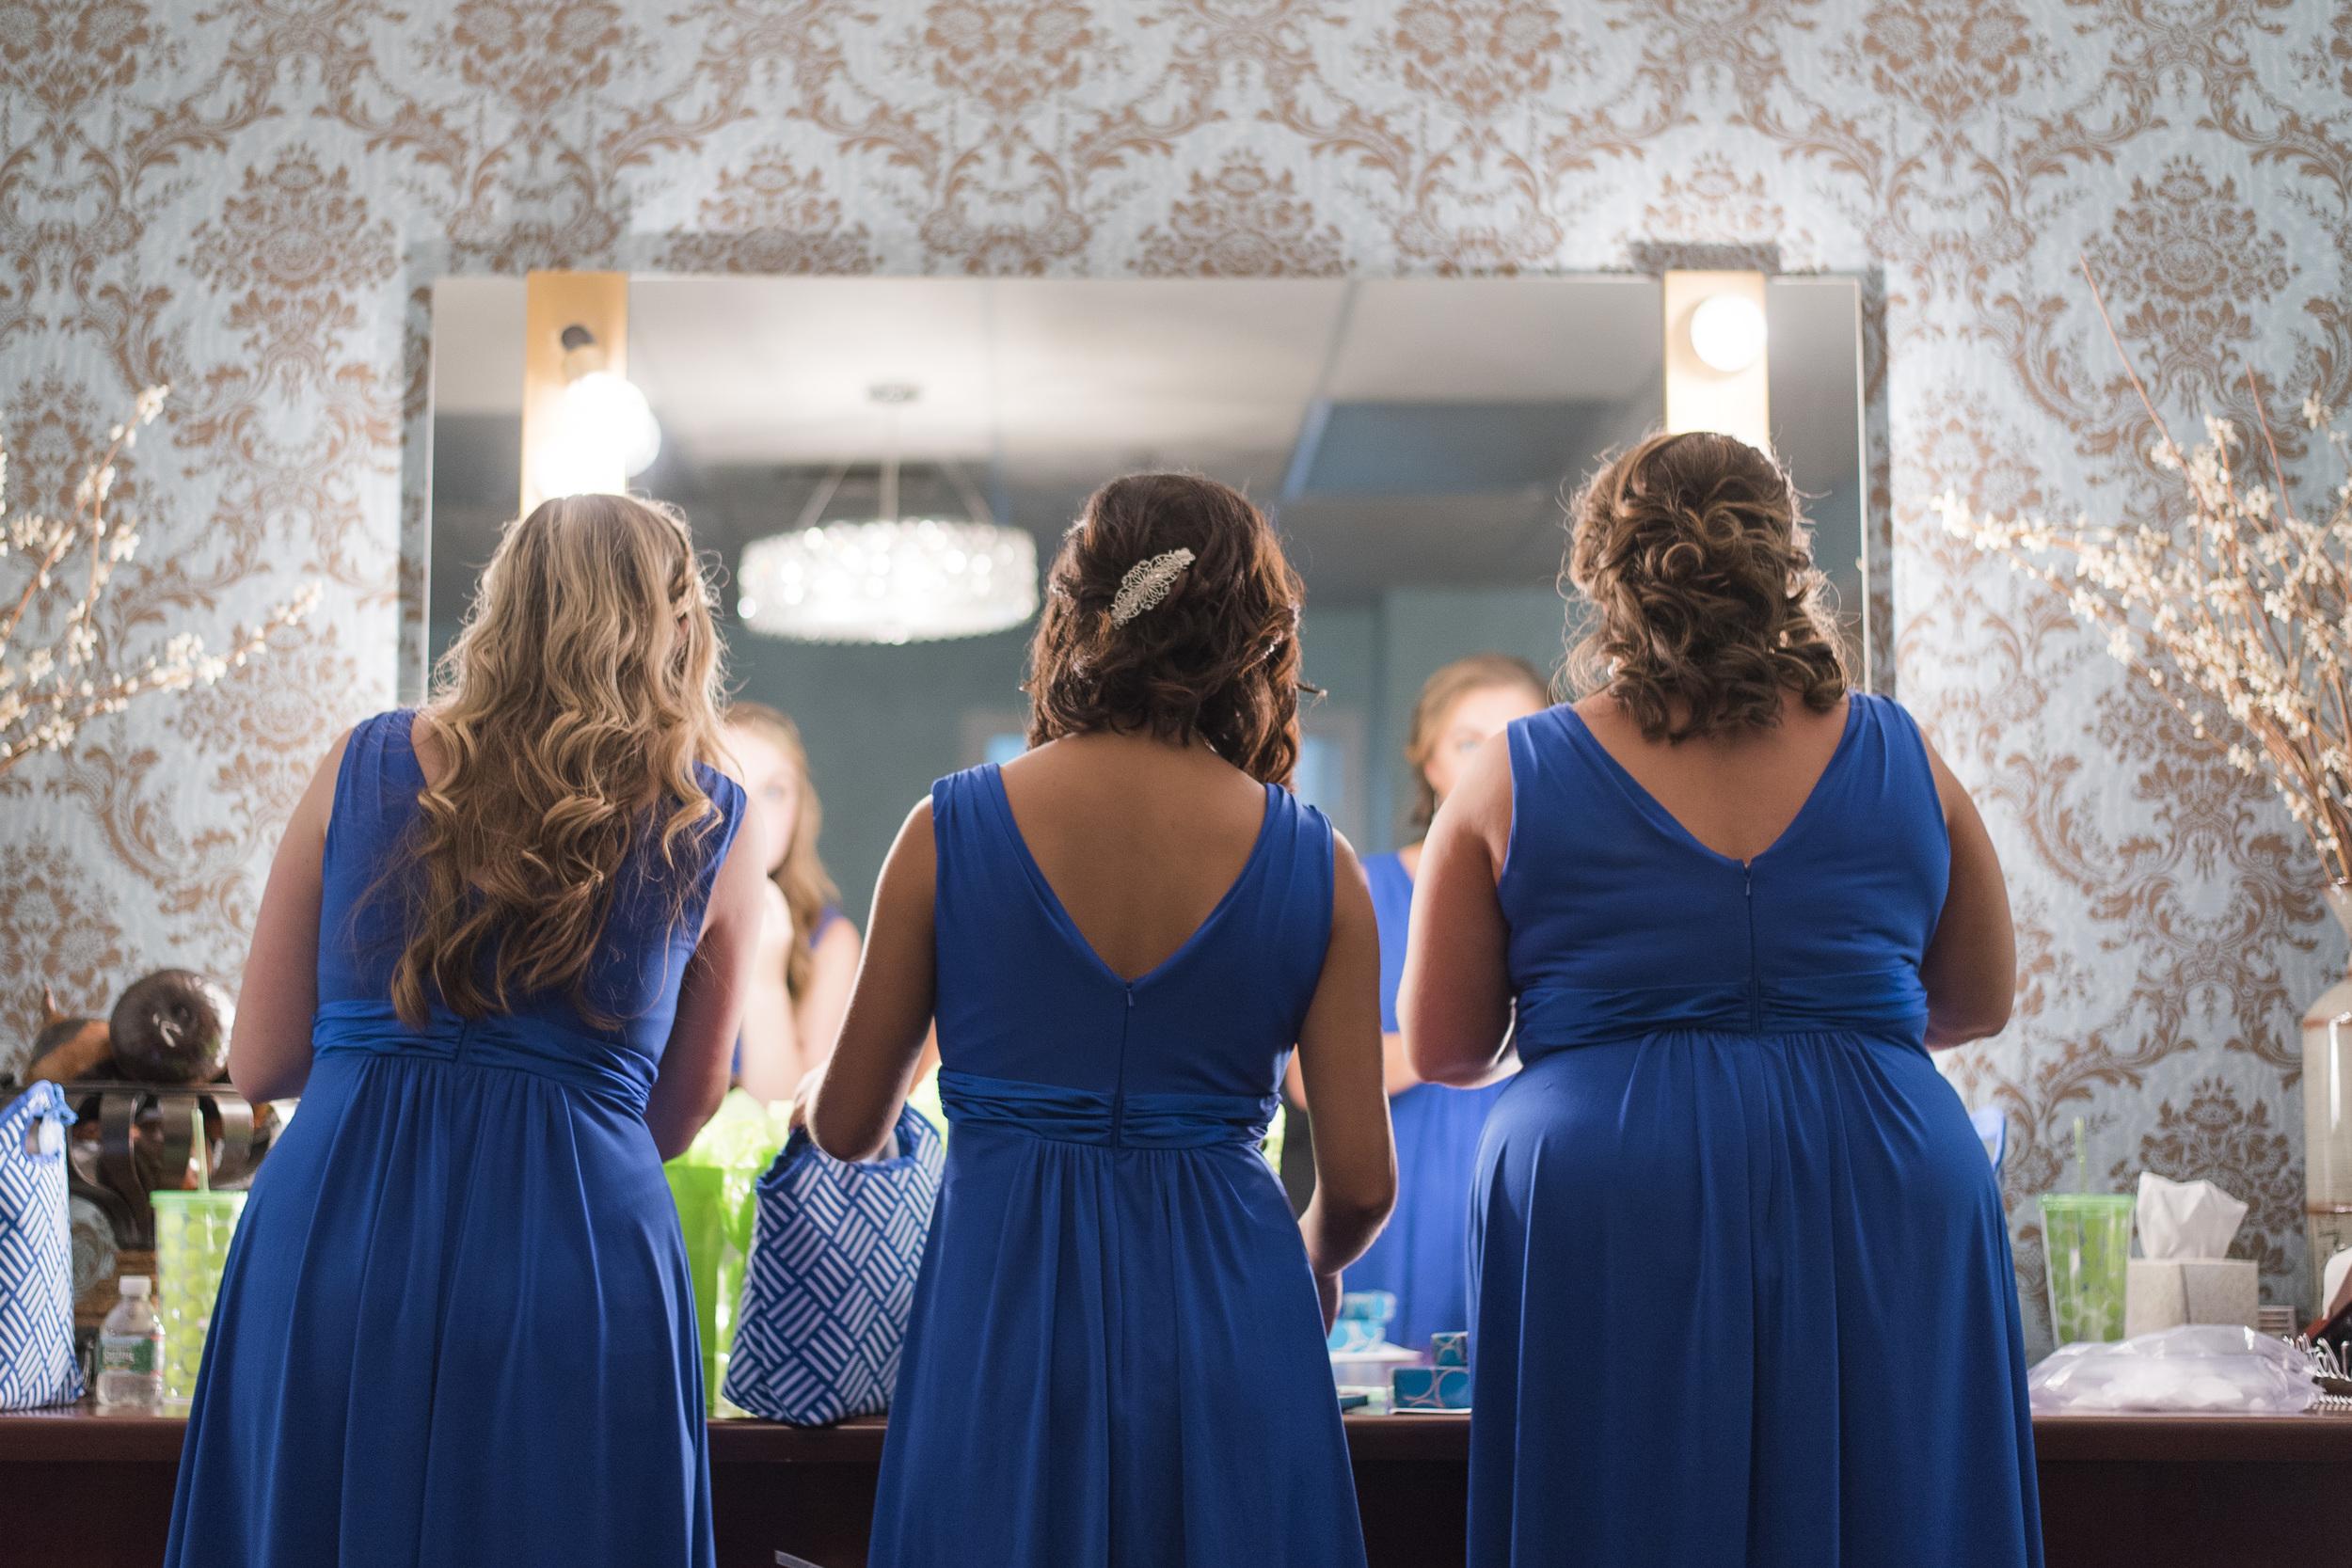 New_jersey_blue_heron_pines_wedding20150529_0542.jpg